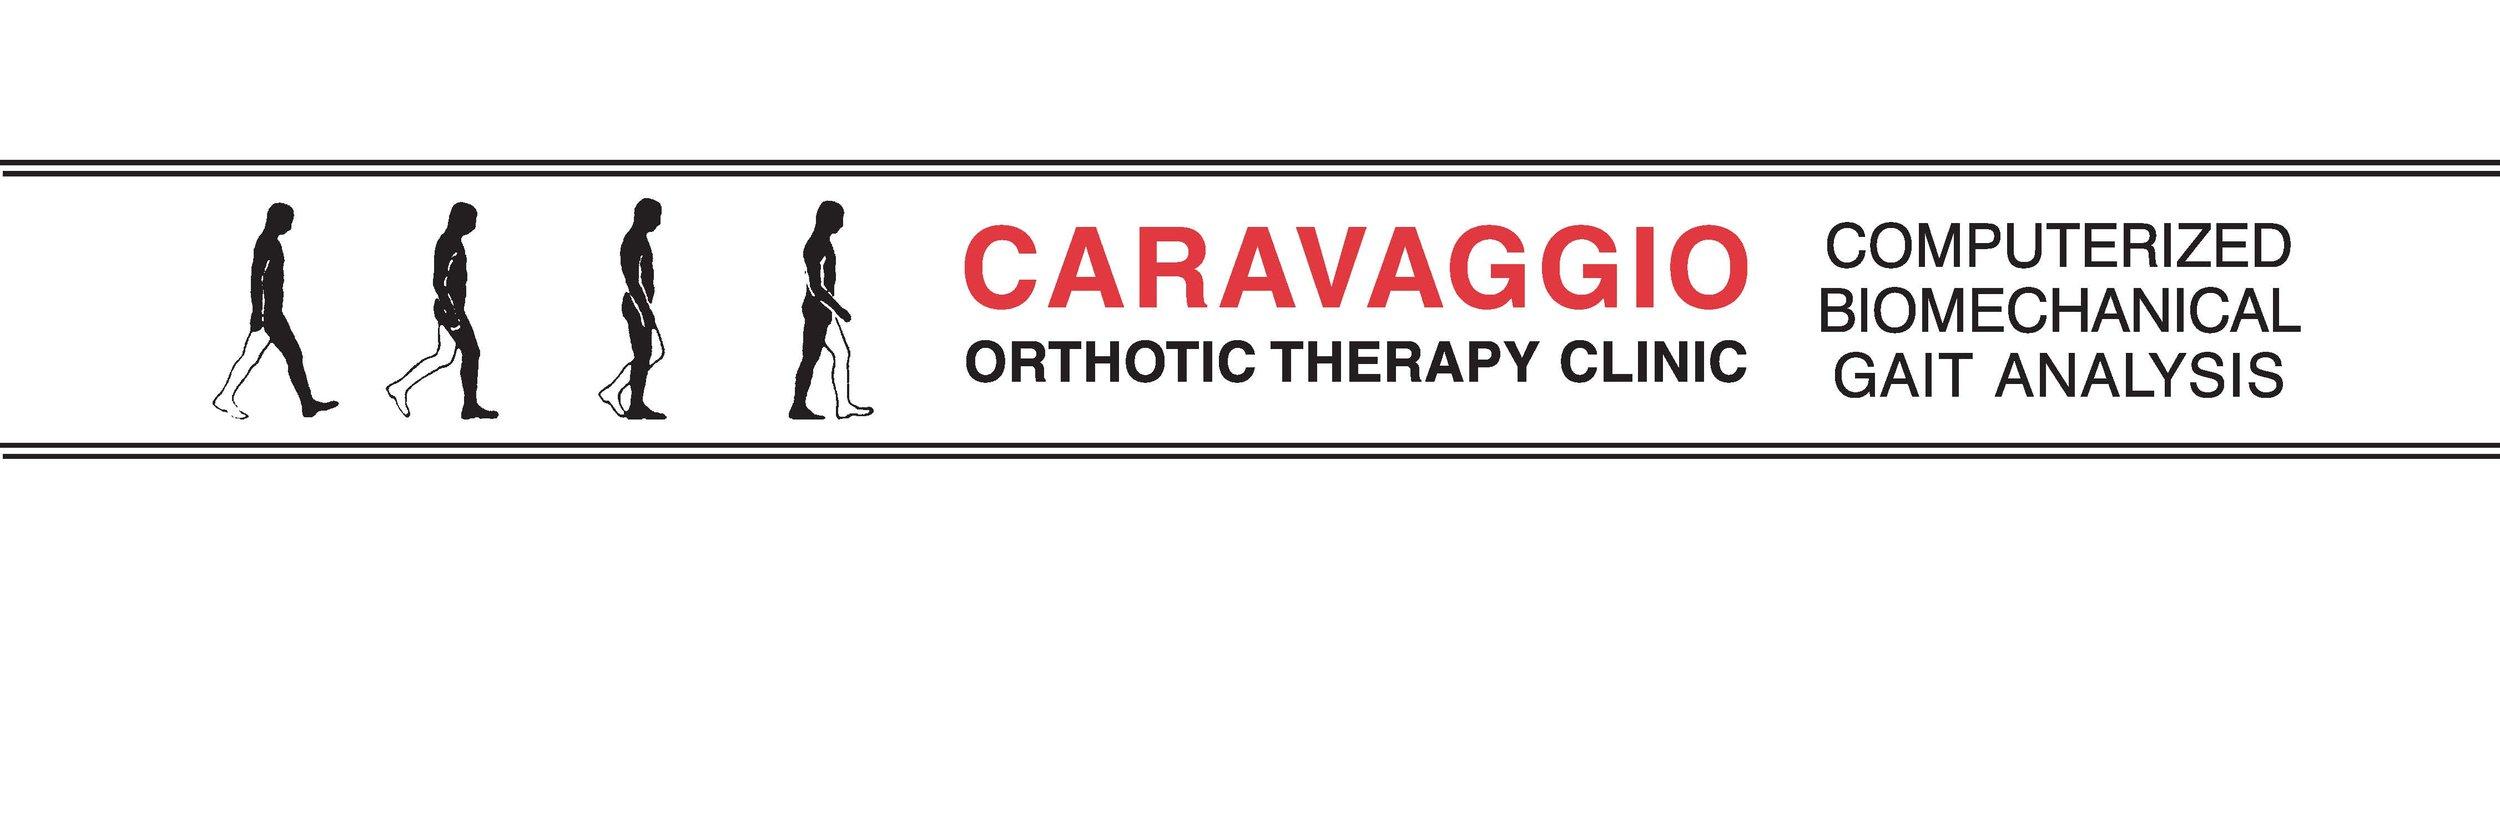 Caravaggio 2017 - no address.jpg